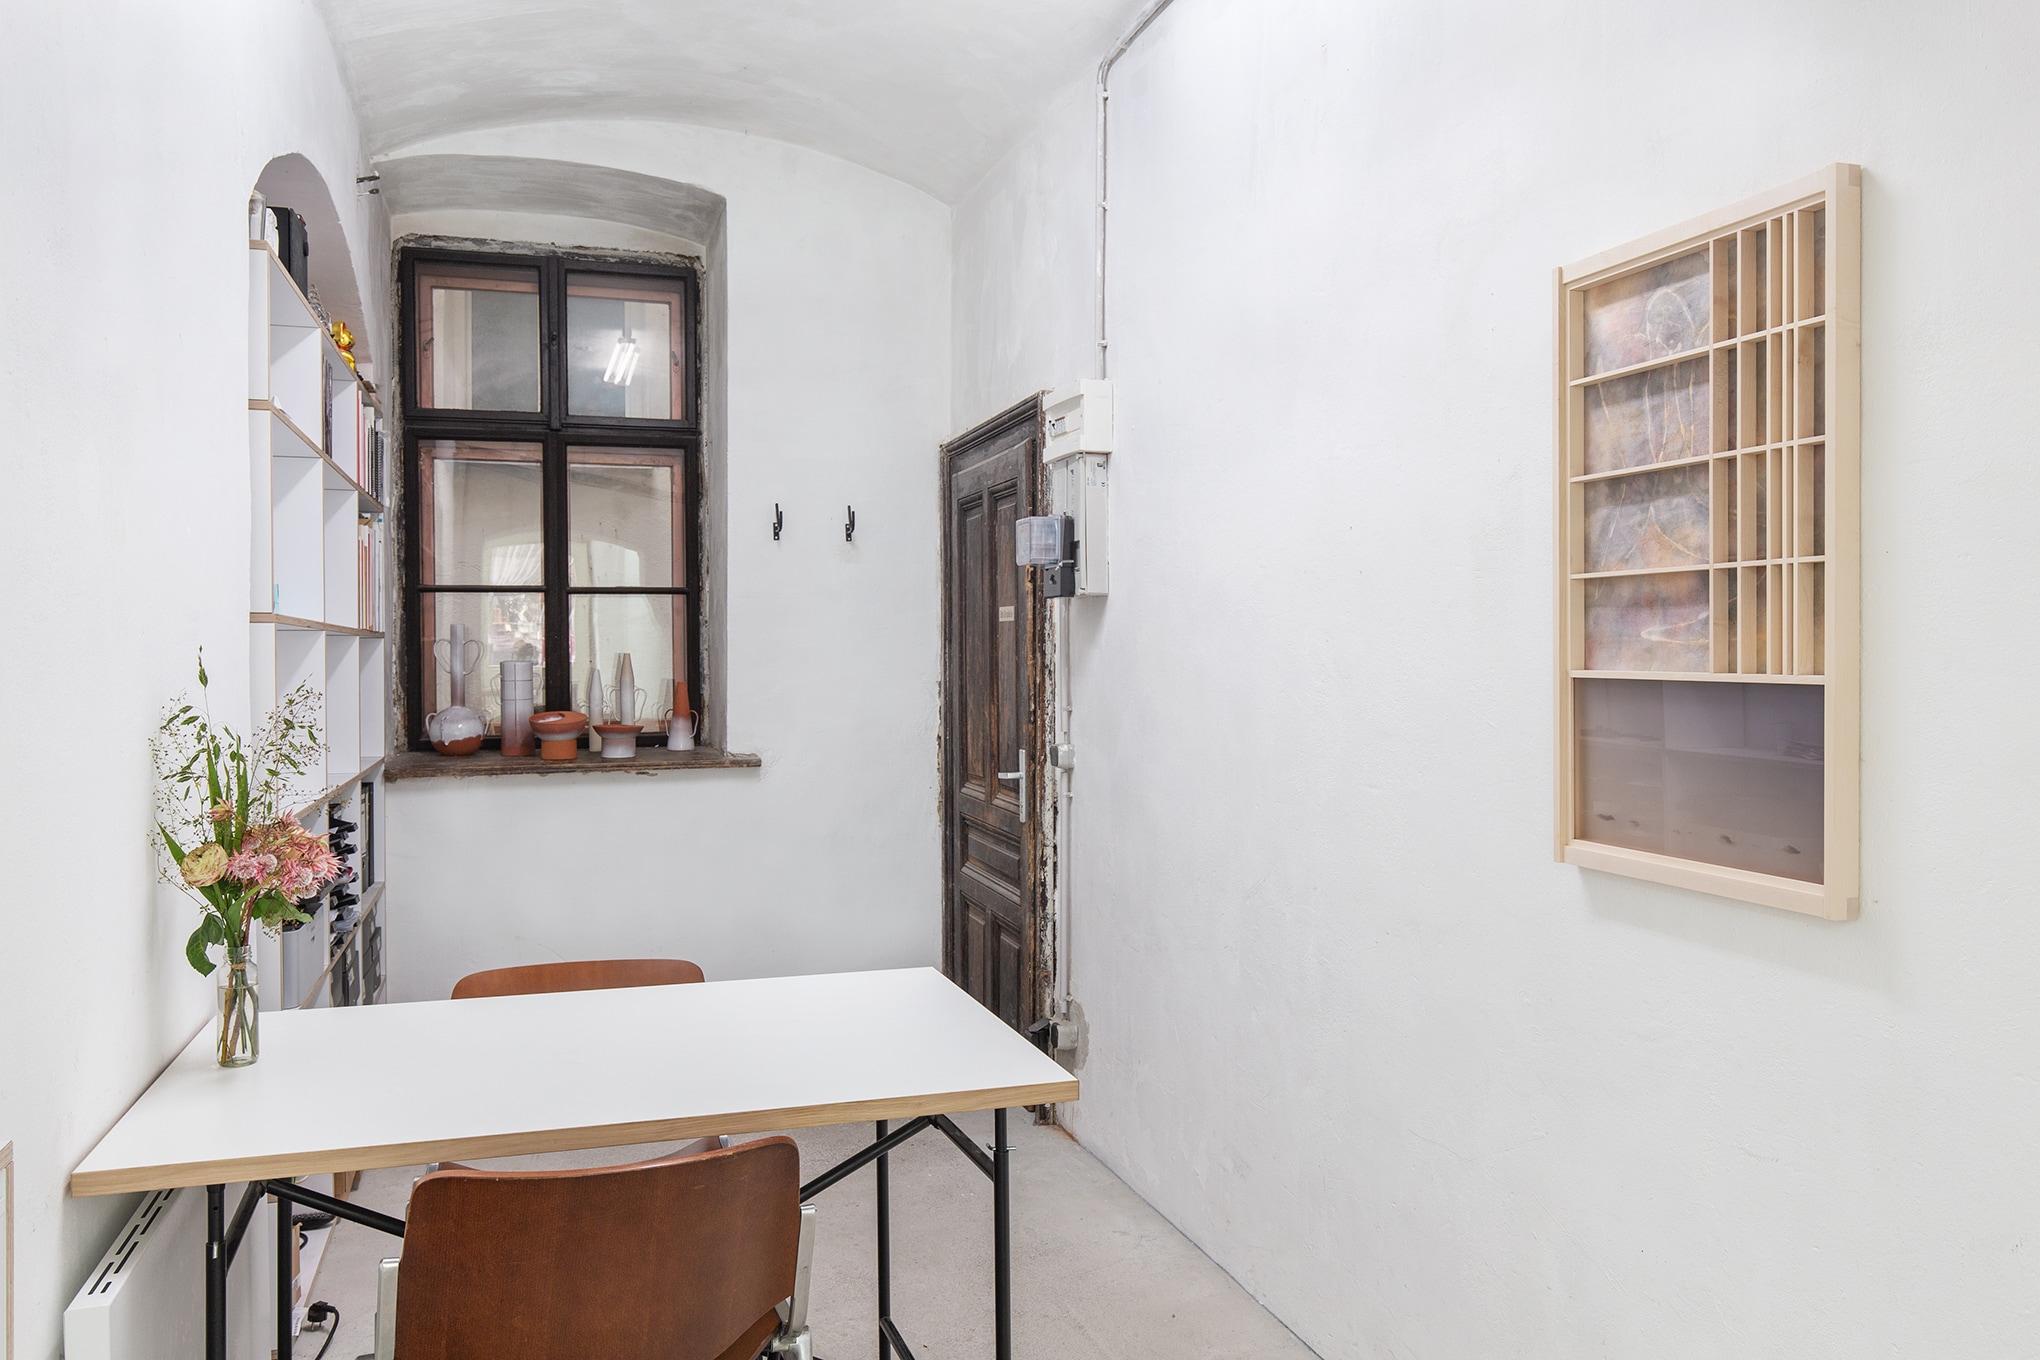 Chiara Bals & Jumpei Shimada, time sits crosslegged, exhibition view